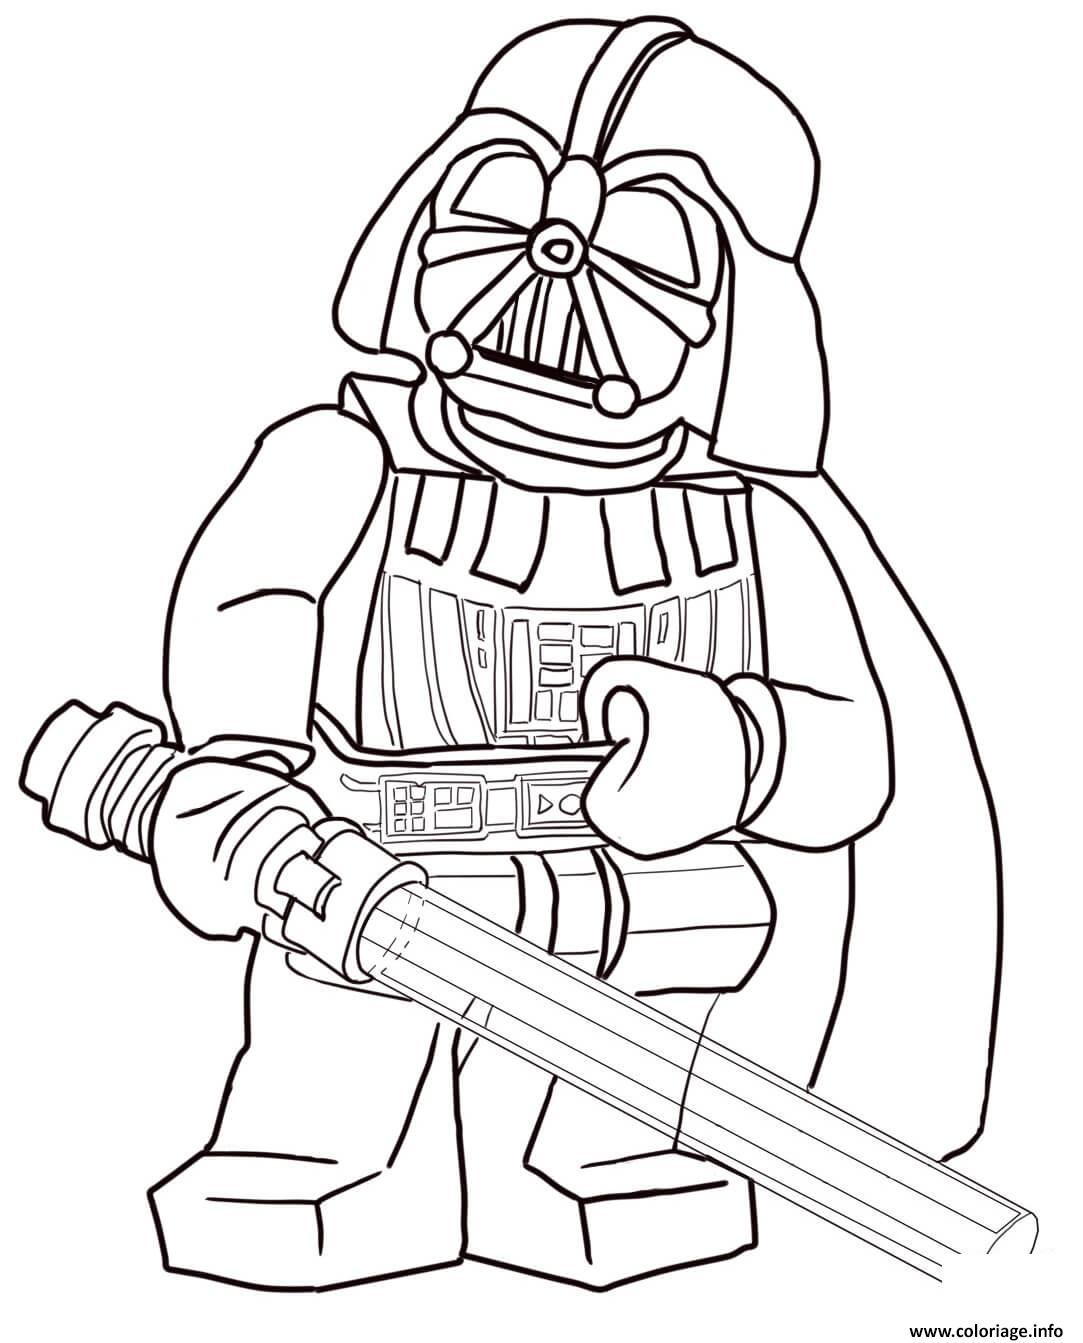 Coloriage Lego Star Wars Darth Vader Dessin Lego Star Wars A Imprimer